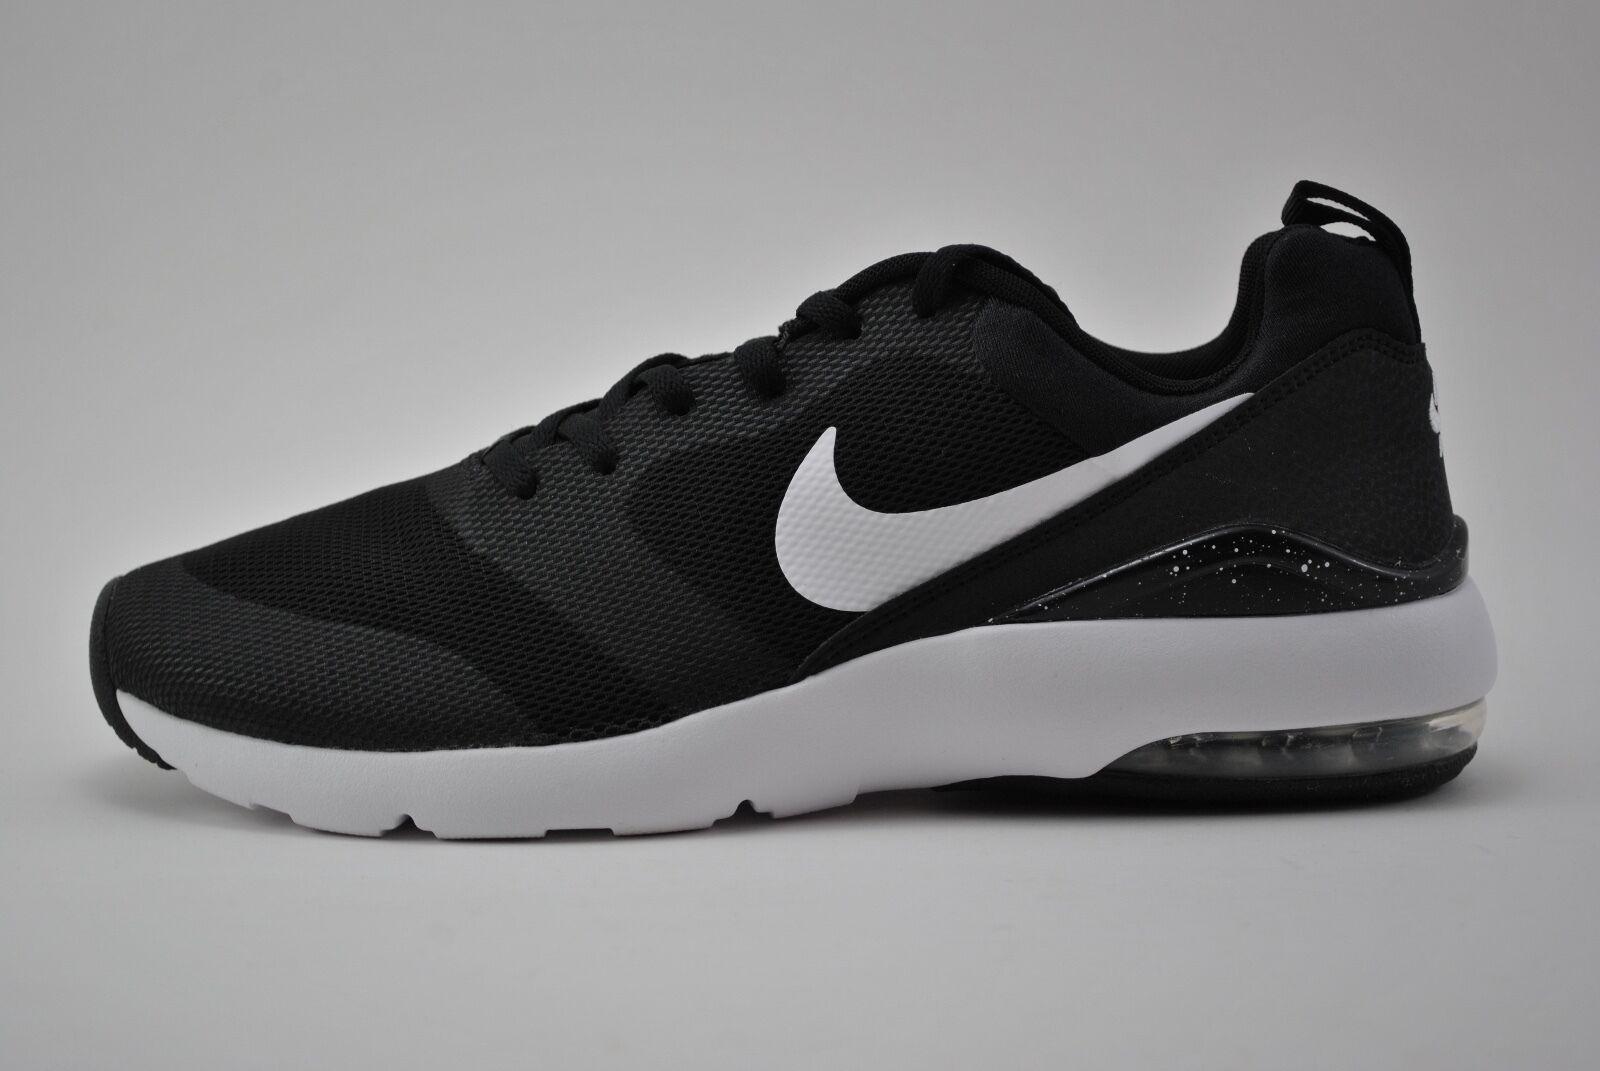 Womens Nike Air Max Siren Running Shoes Size 11.5 Black White Silver 749510 004